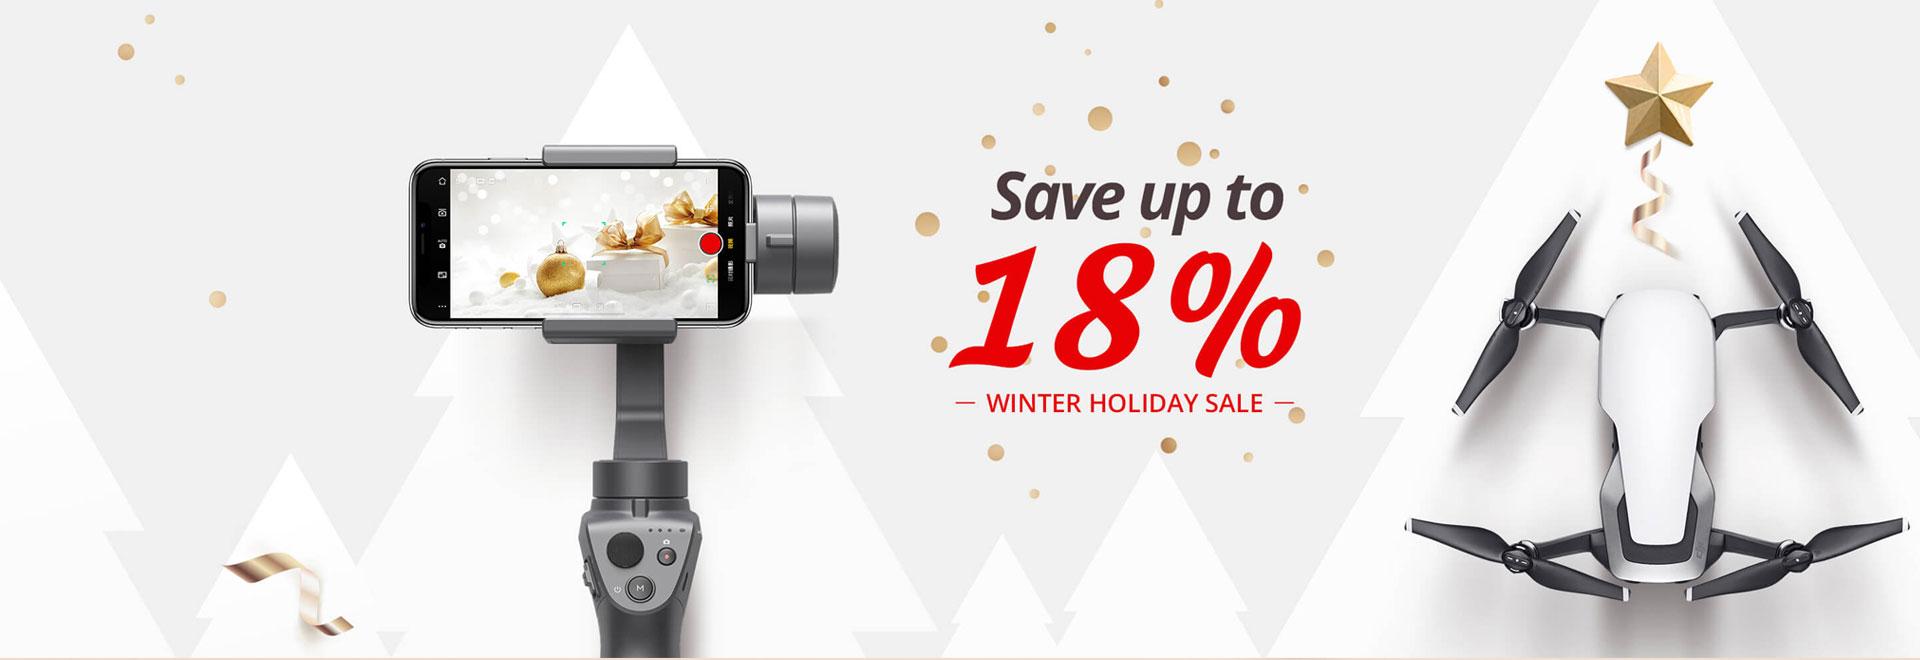 DJI Winter Holiday Sale 2018